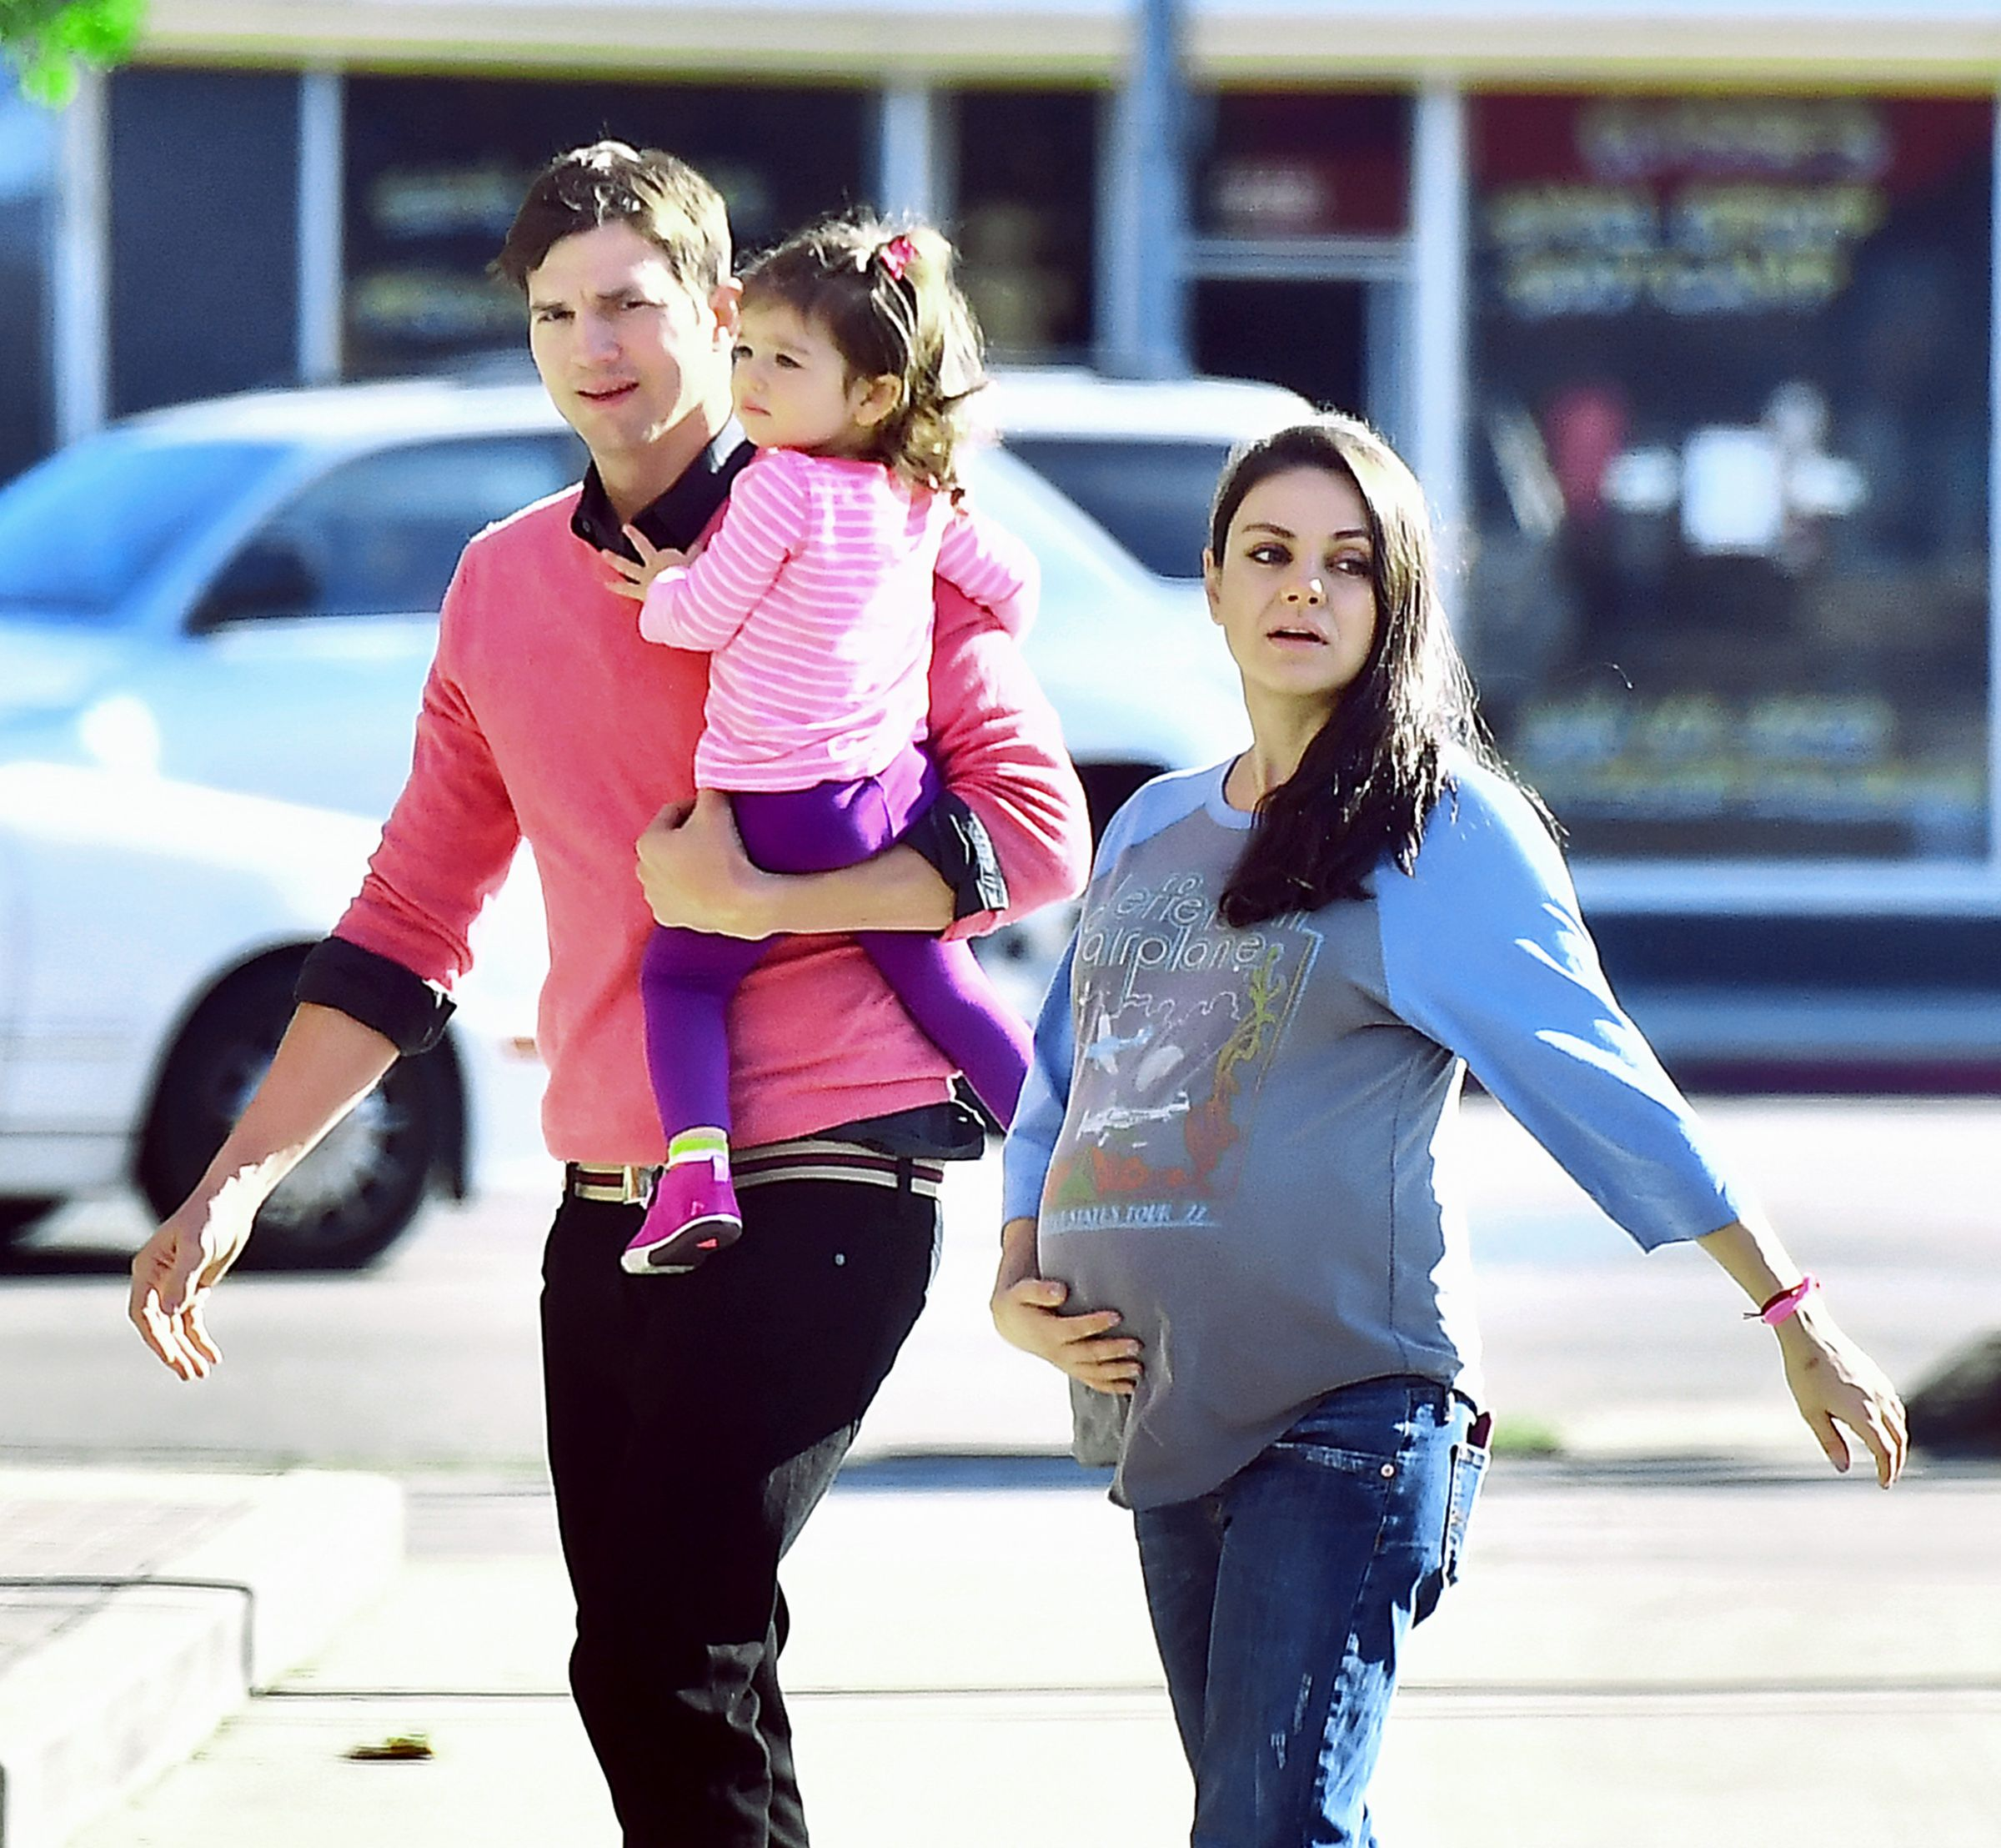 Mila Kunis And Ashton Kutcher S Kids Look Just Like Them With